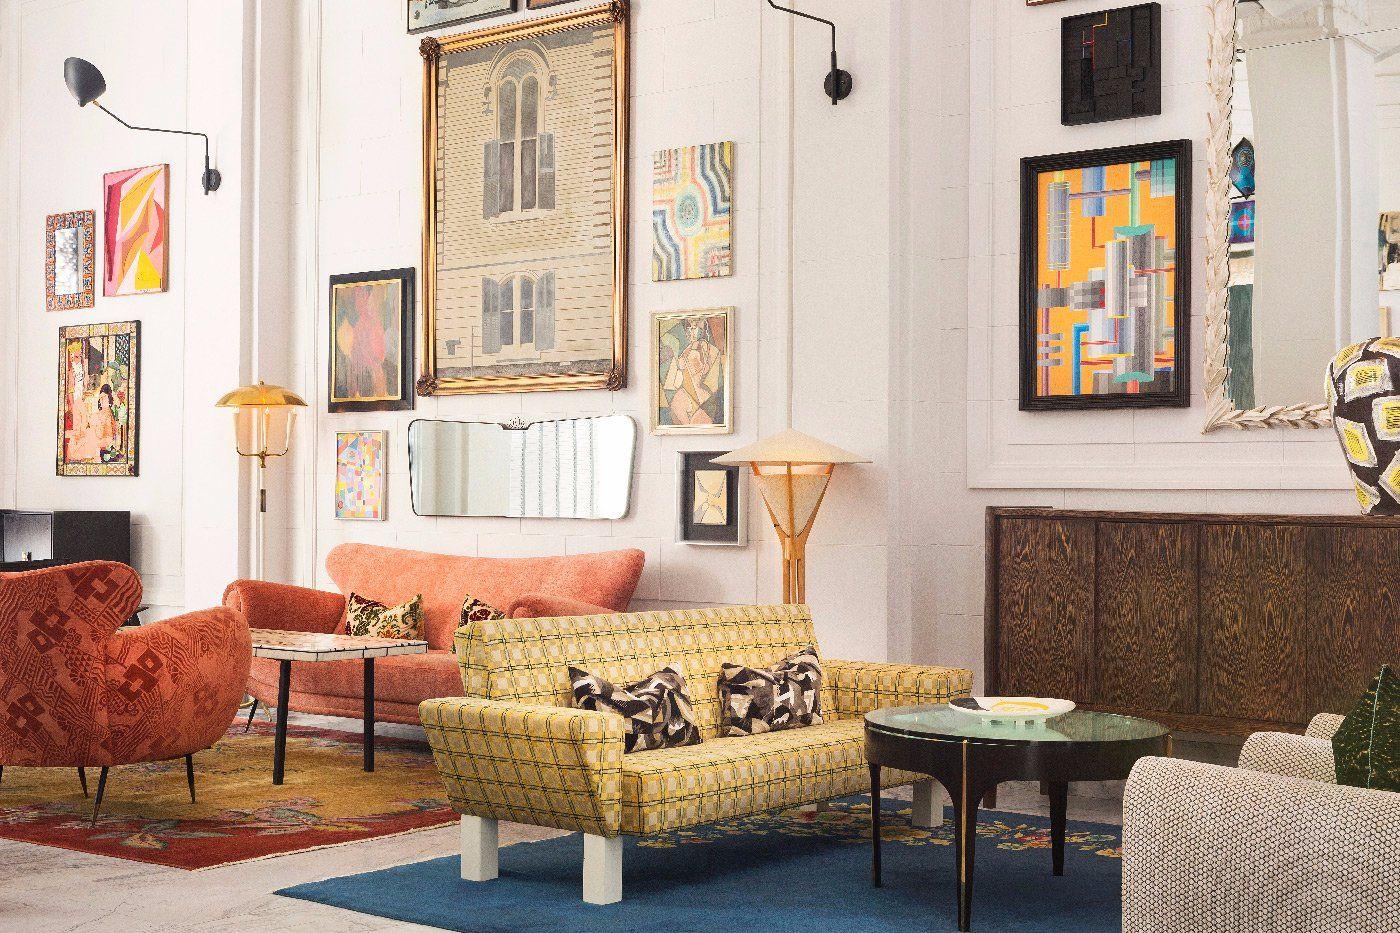 San Francisco Proper Hotel By Kelly Wearstler Luxury Home Decor Opulent Interiors Home Decor